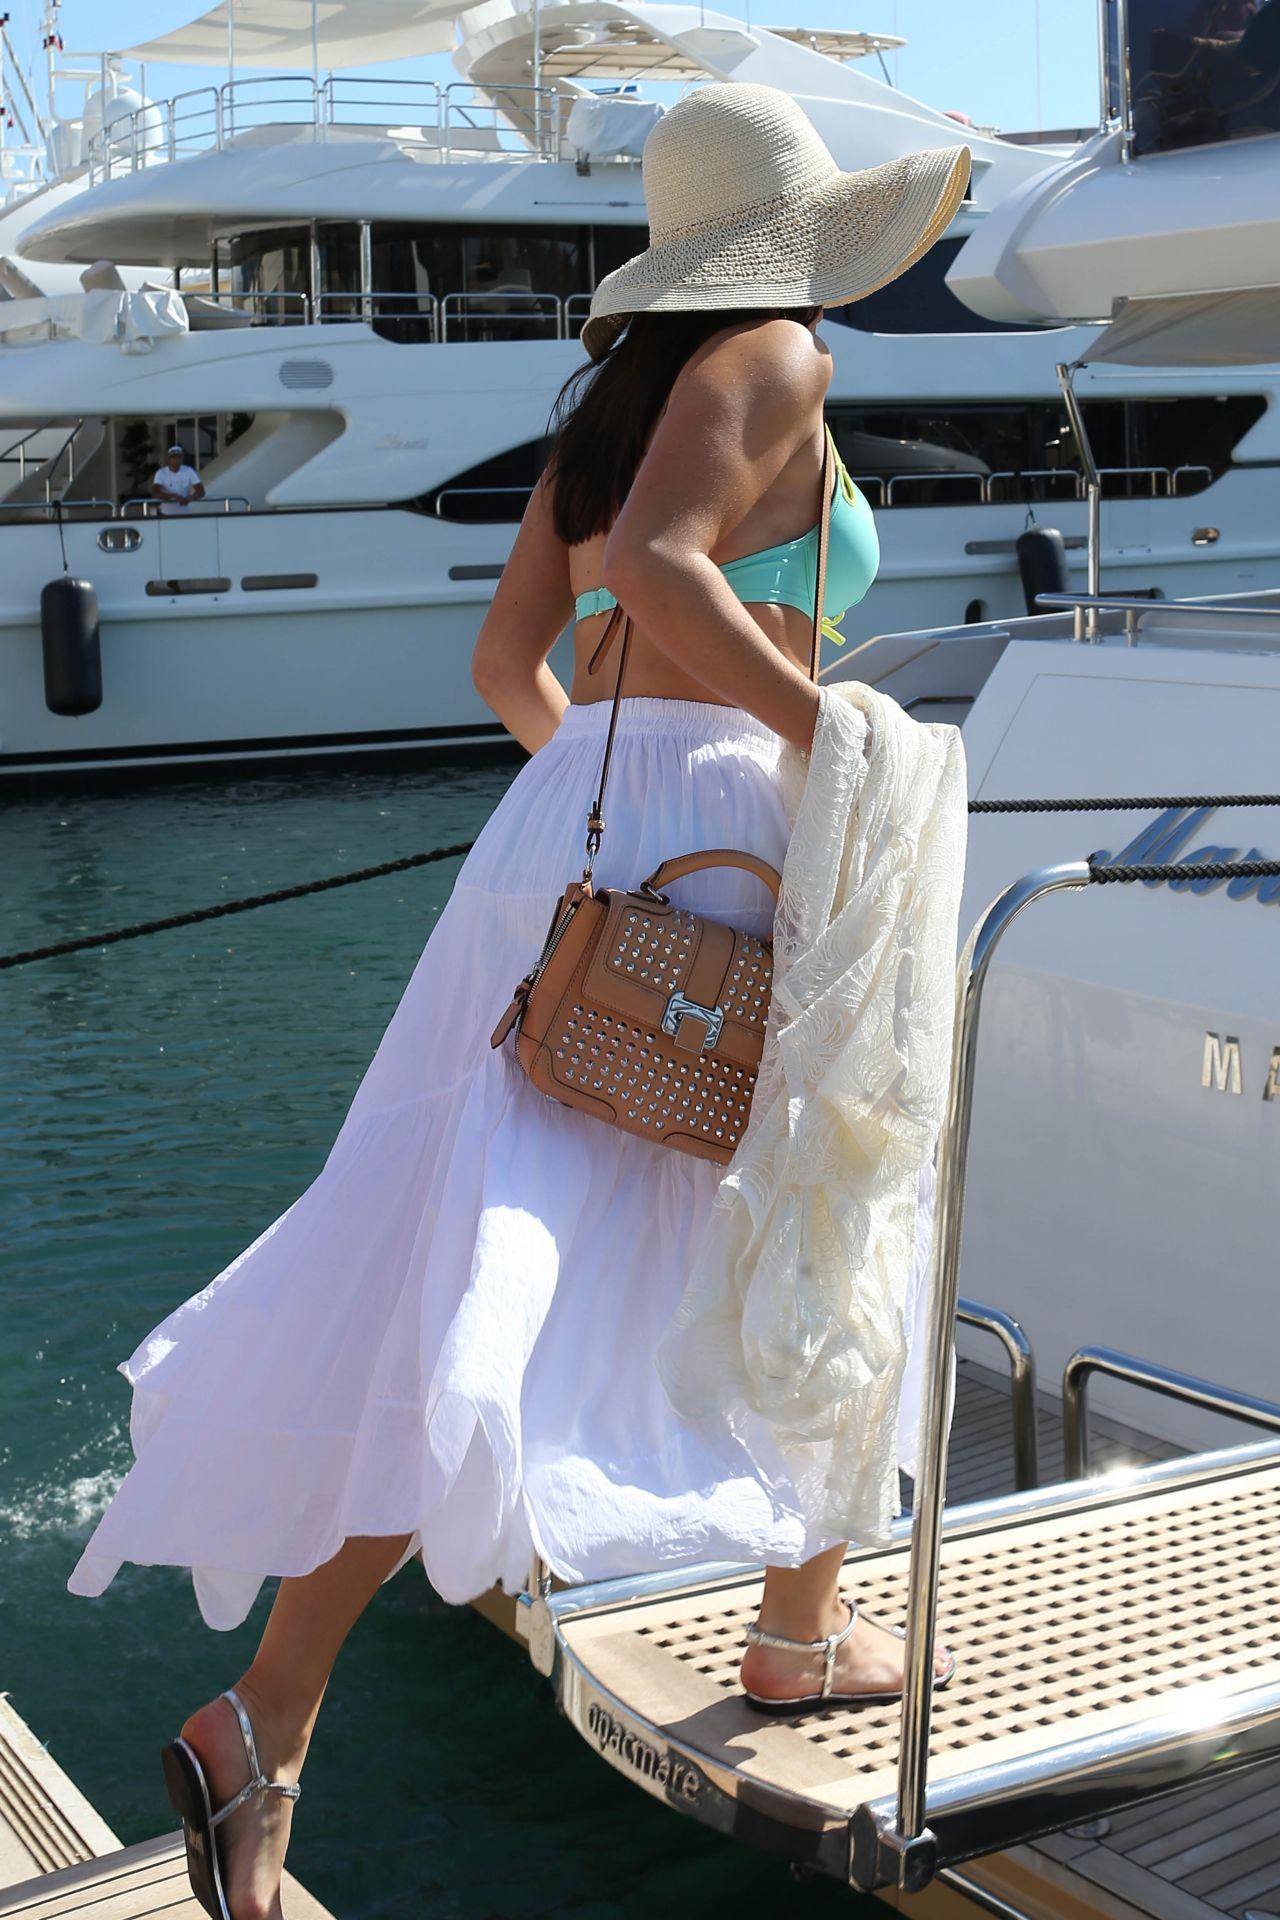 Jessica Lowndes Bikini Candids  on a Boat in Cannes